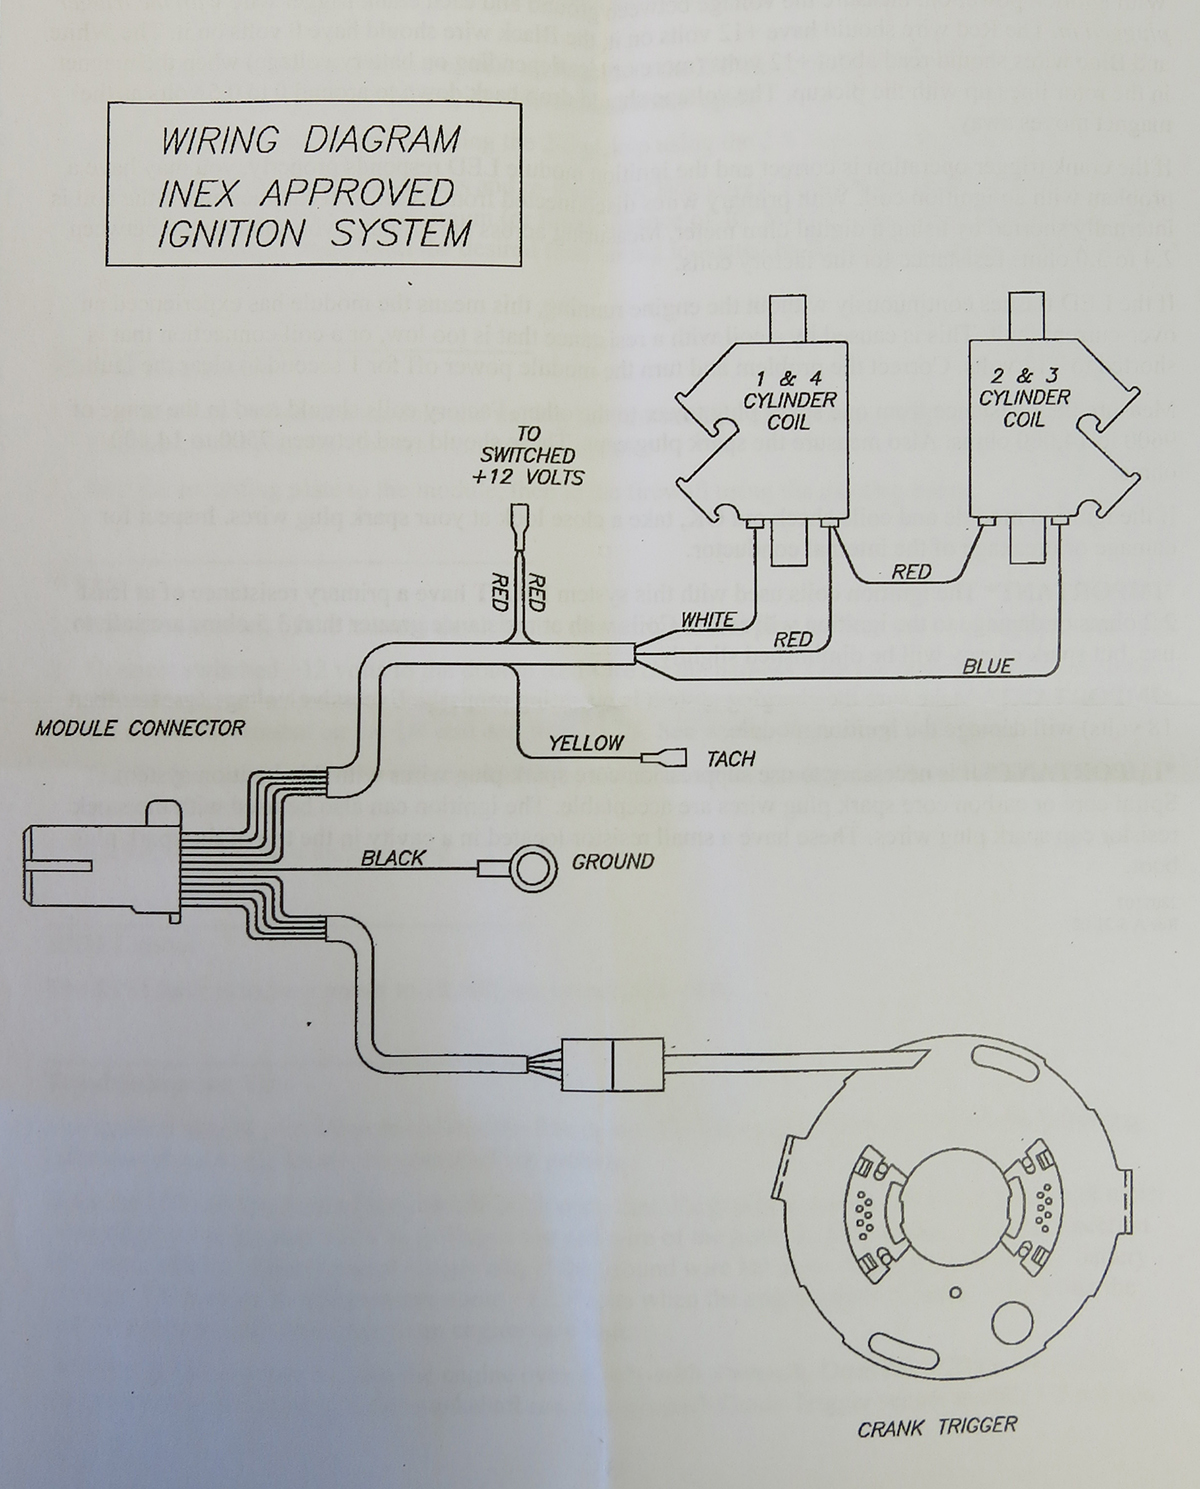 Old Fashioned 02 Skidoo 380 Wiring Diagram Elaboration - Wiring ...